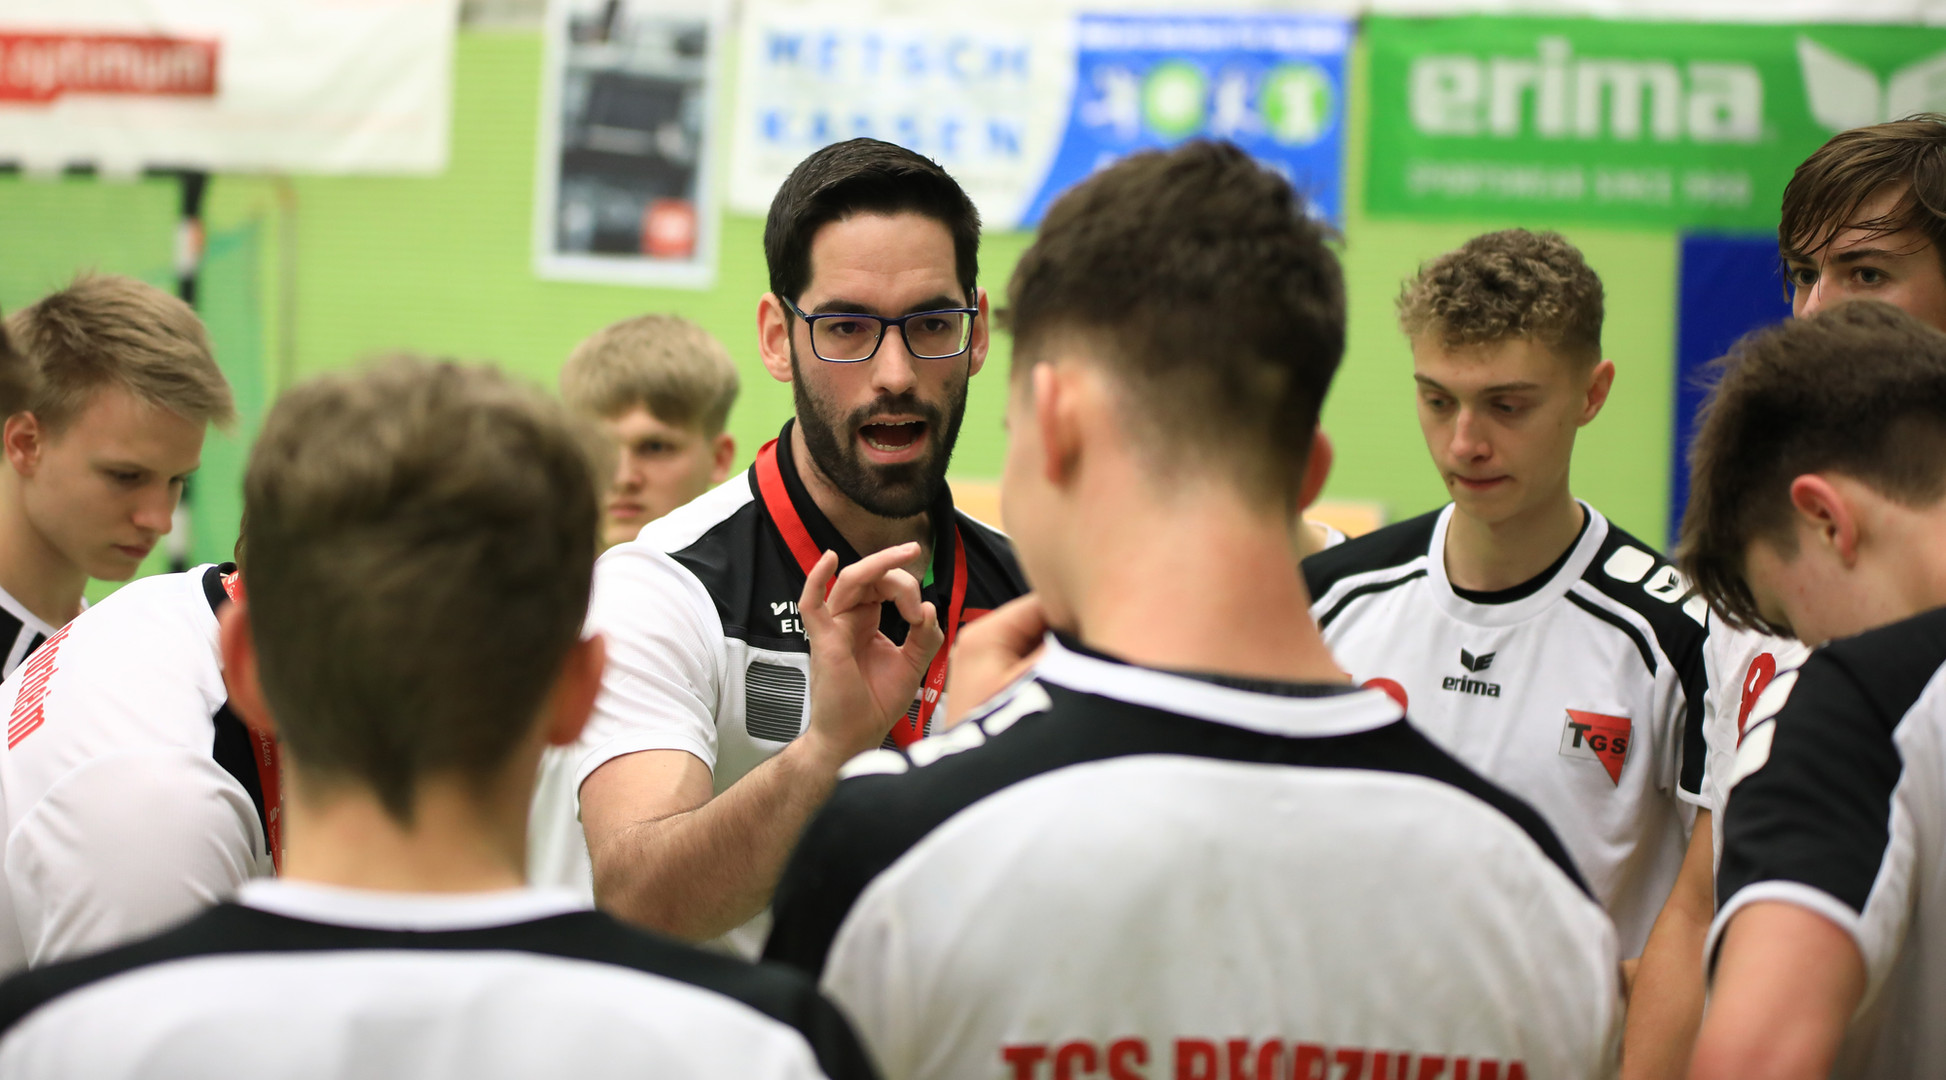 A-Jugend-Trainer Jonathan Binder